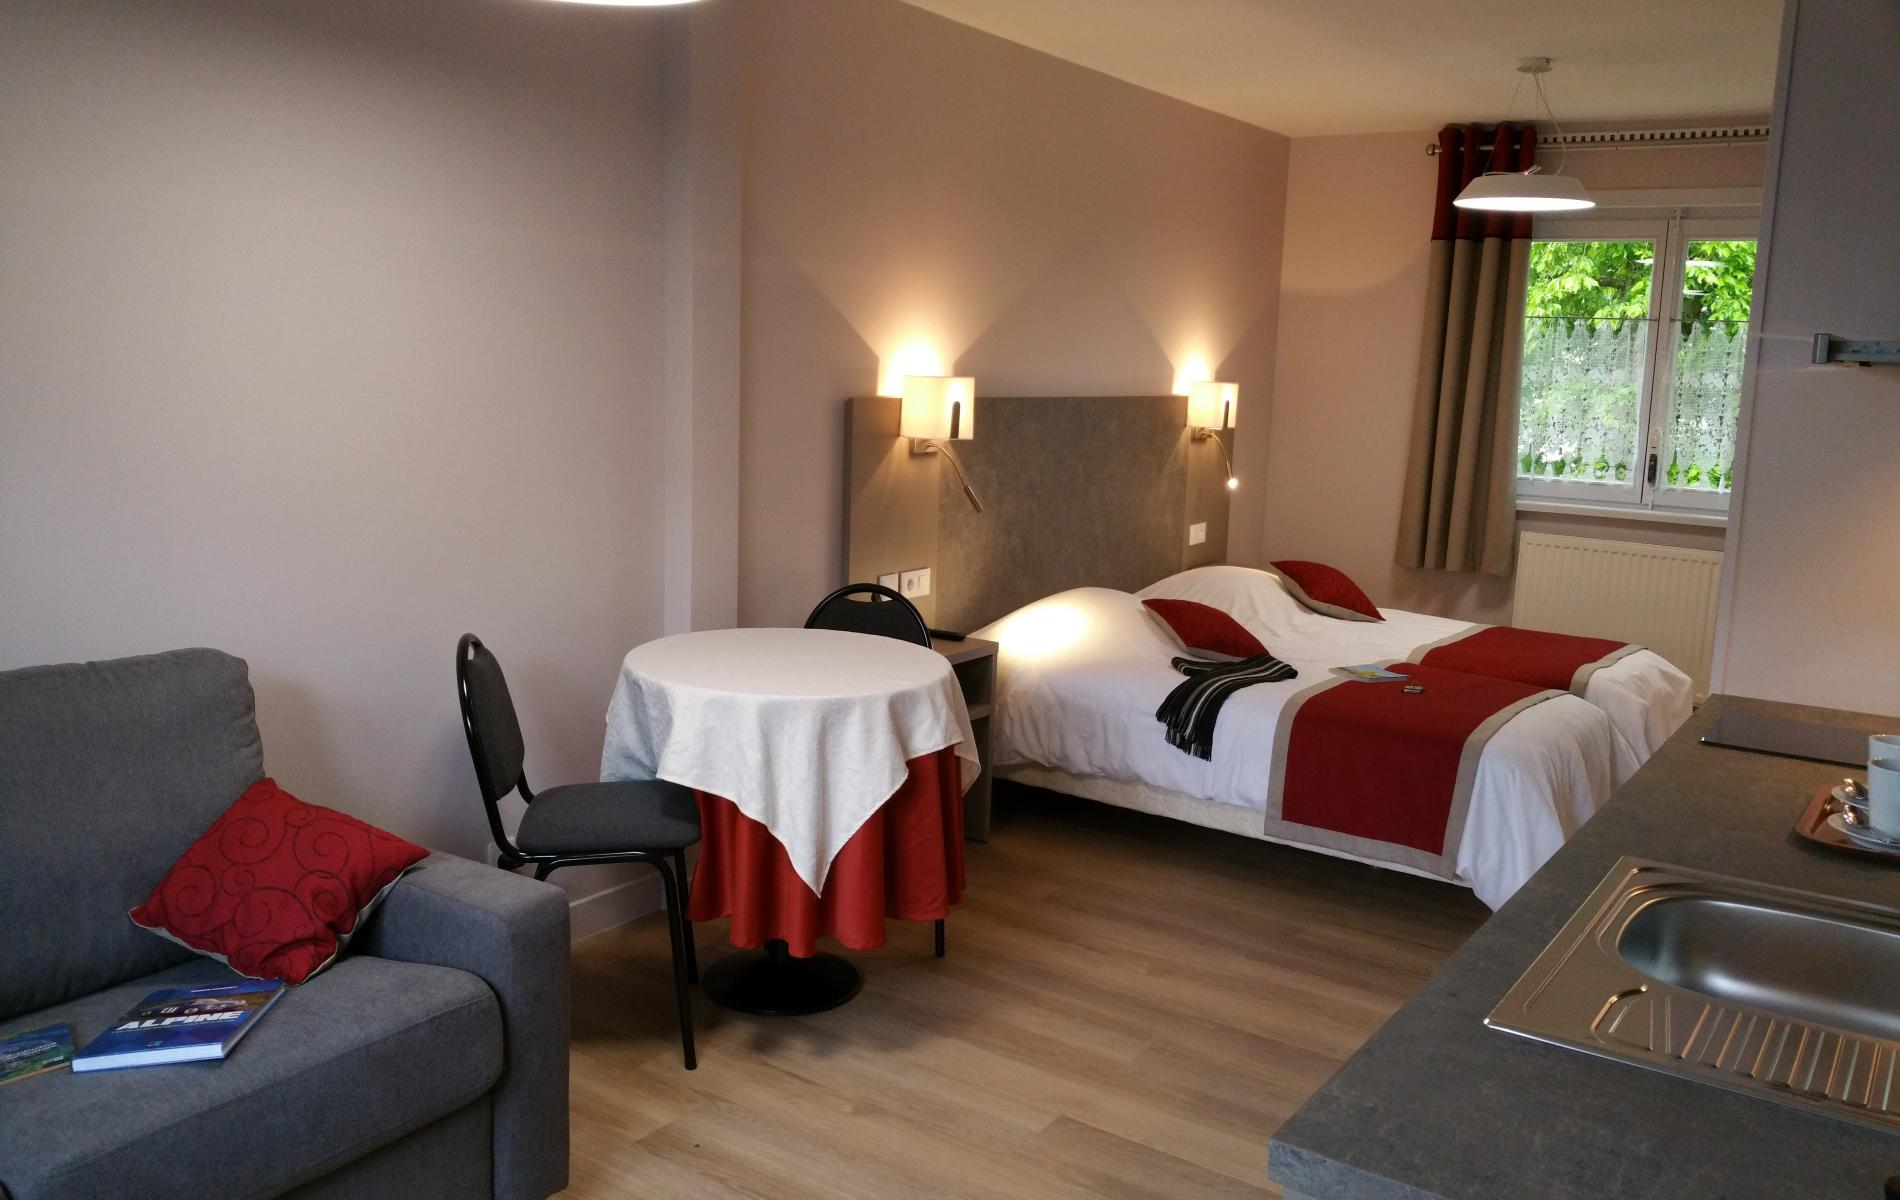 Appart Hotel Saint Omer